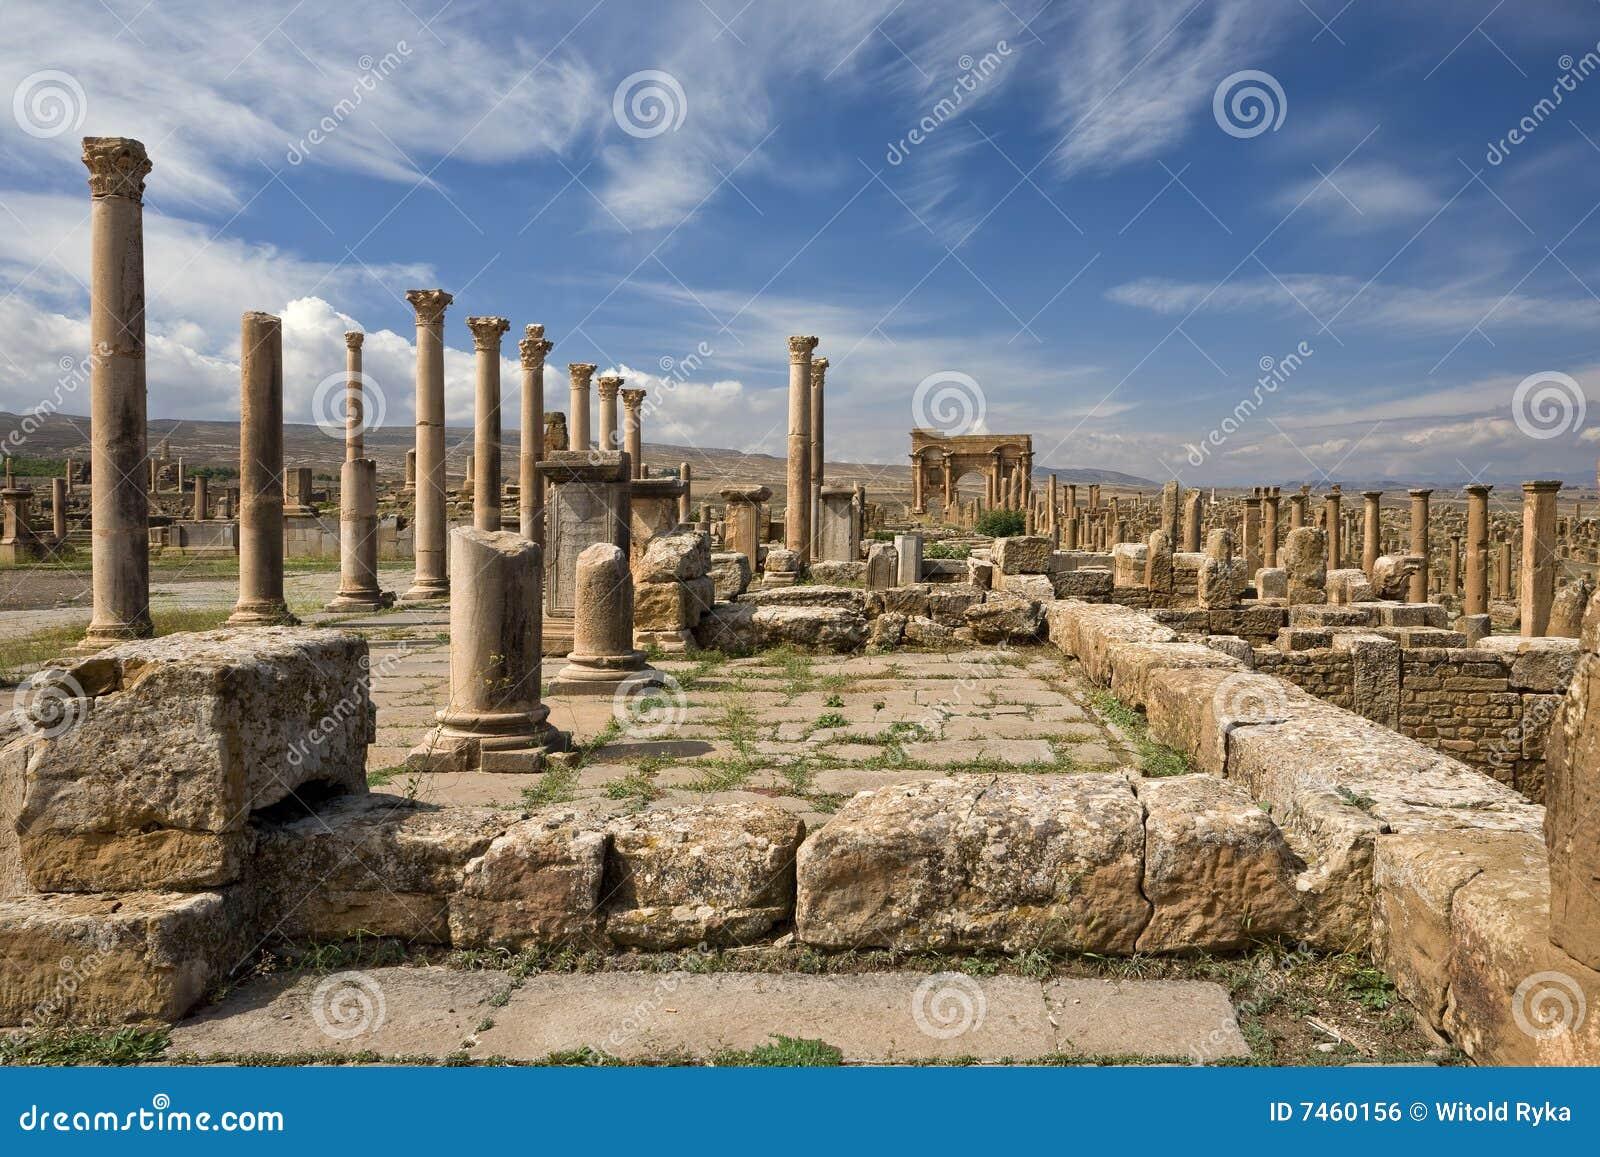 Forum of ancient Thamugadi stock photo  Image of ruined